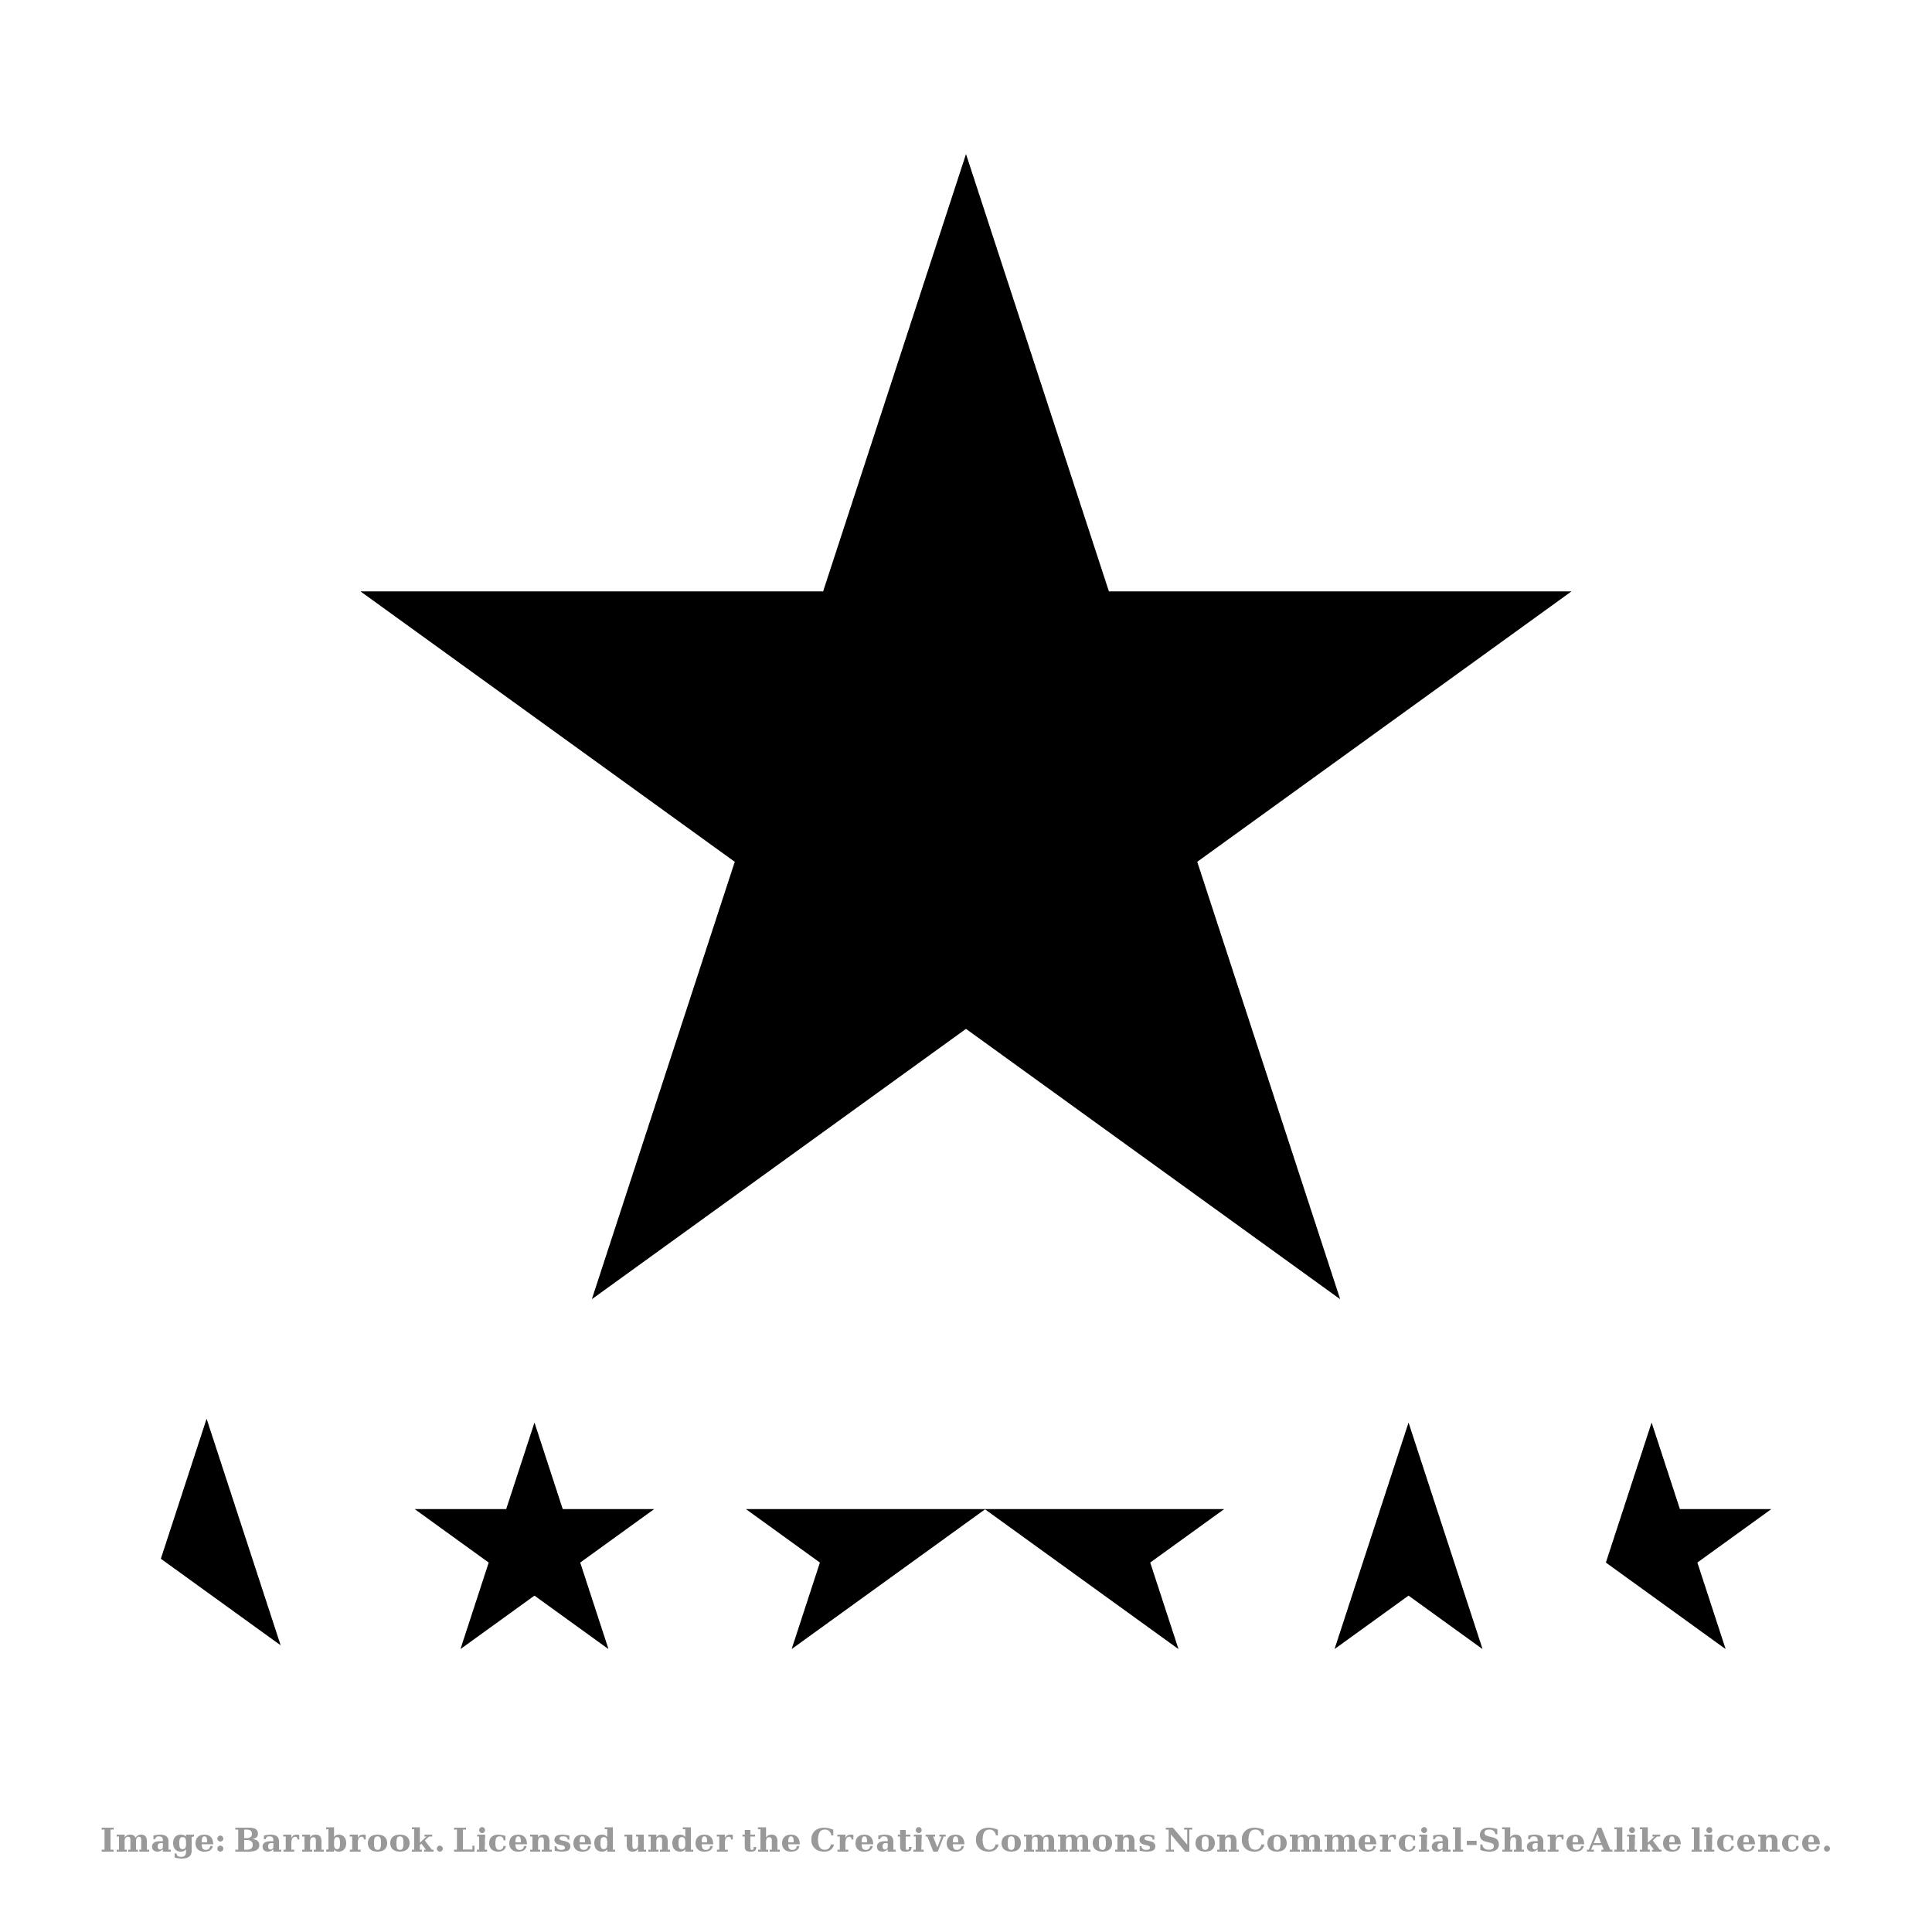 Bowie Blackstar © Jonathan Barnbrook